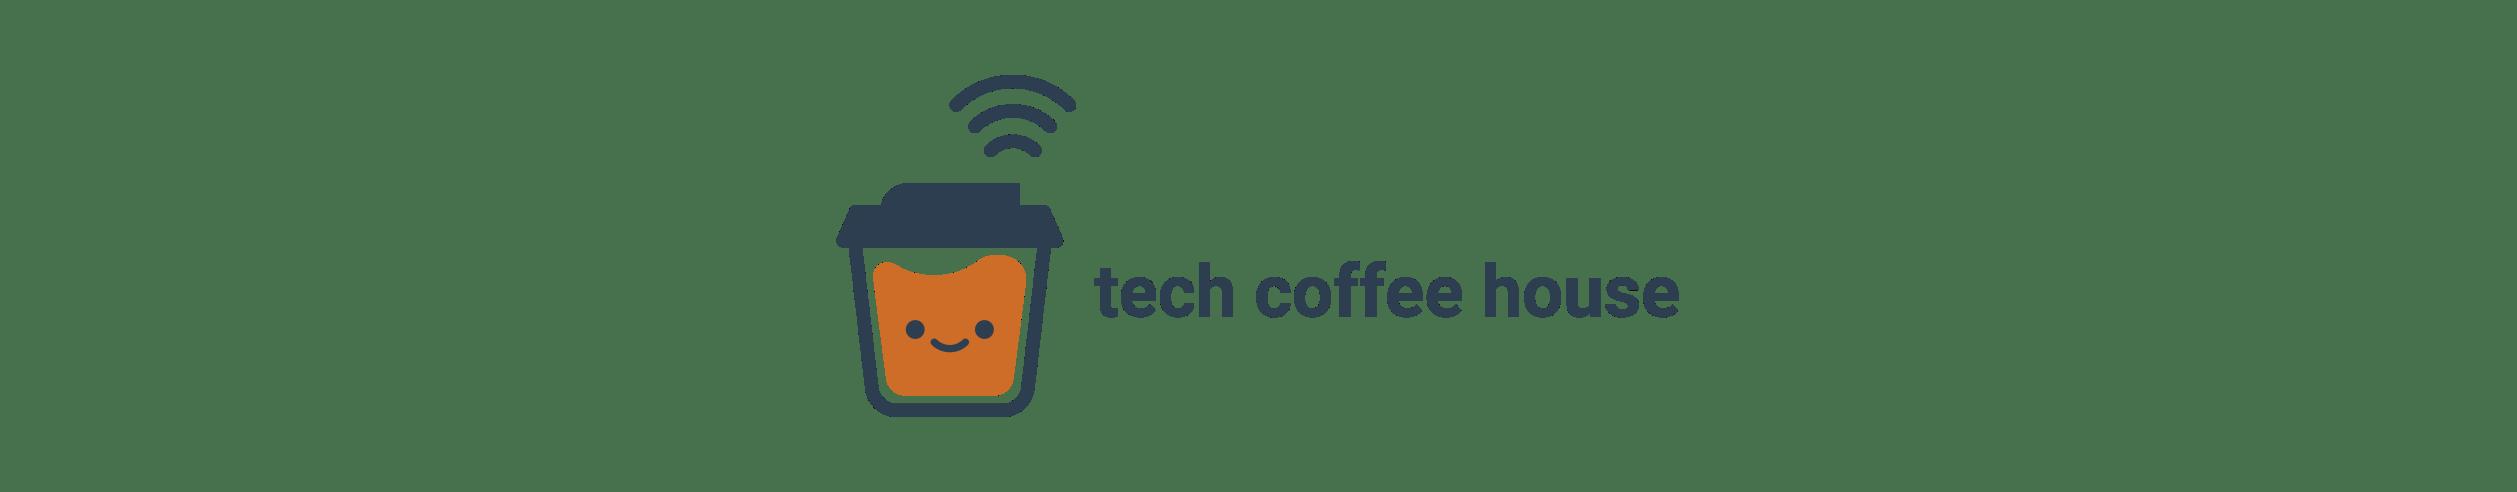 Tech-Coffee-House-new-Logo-02